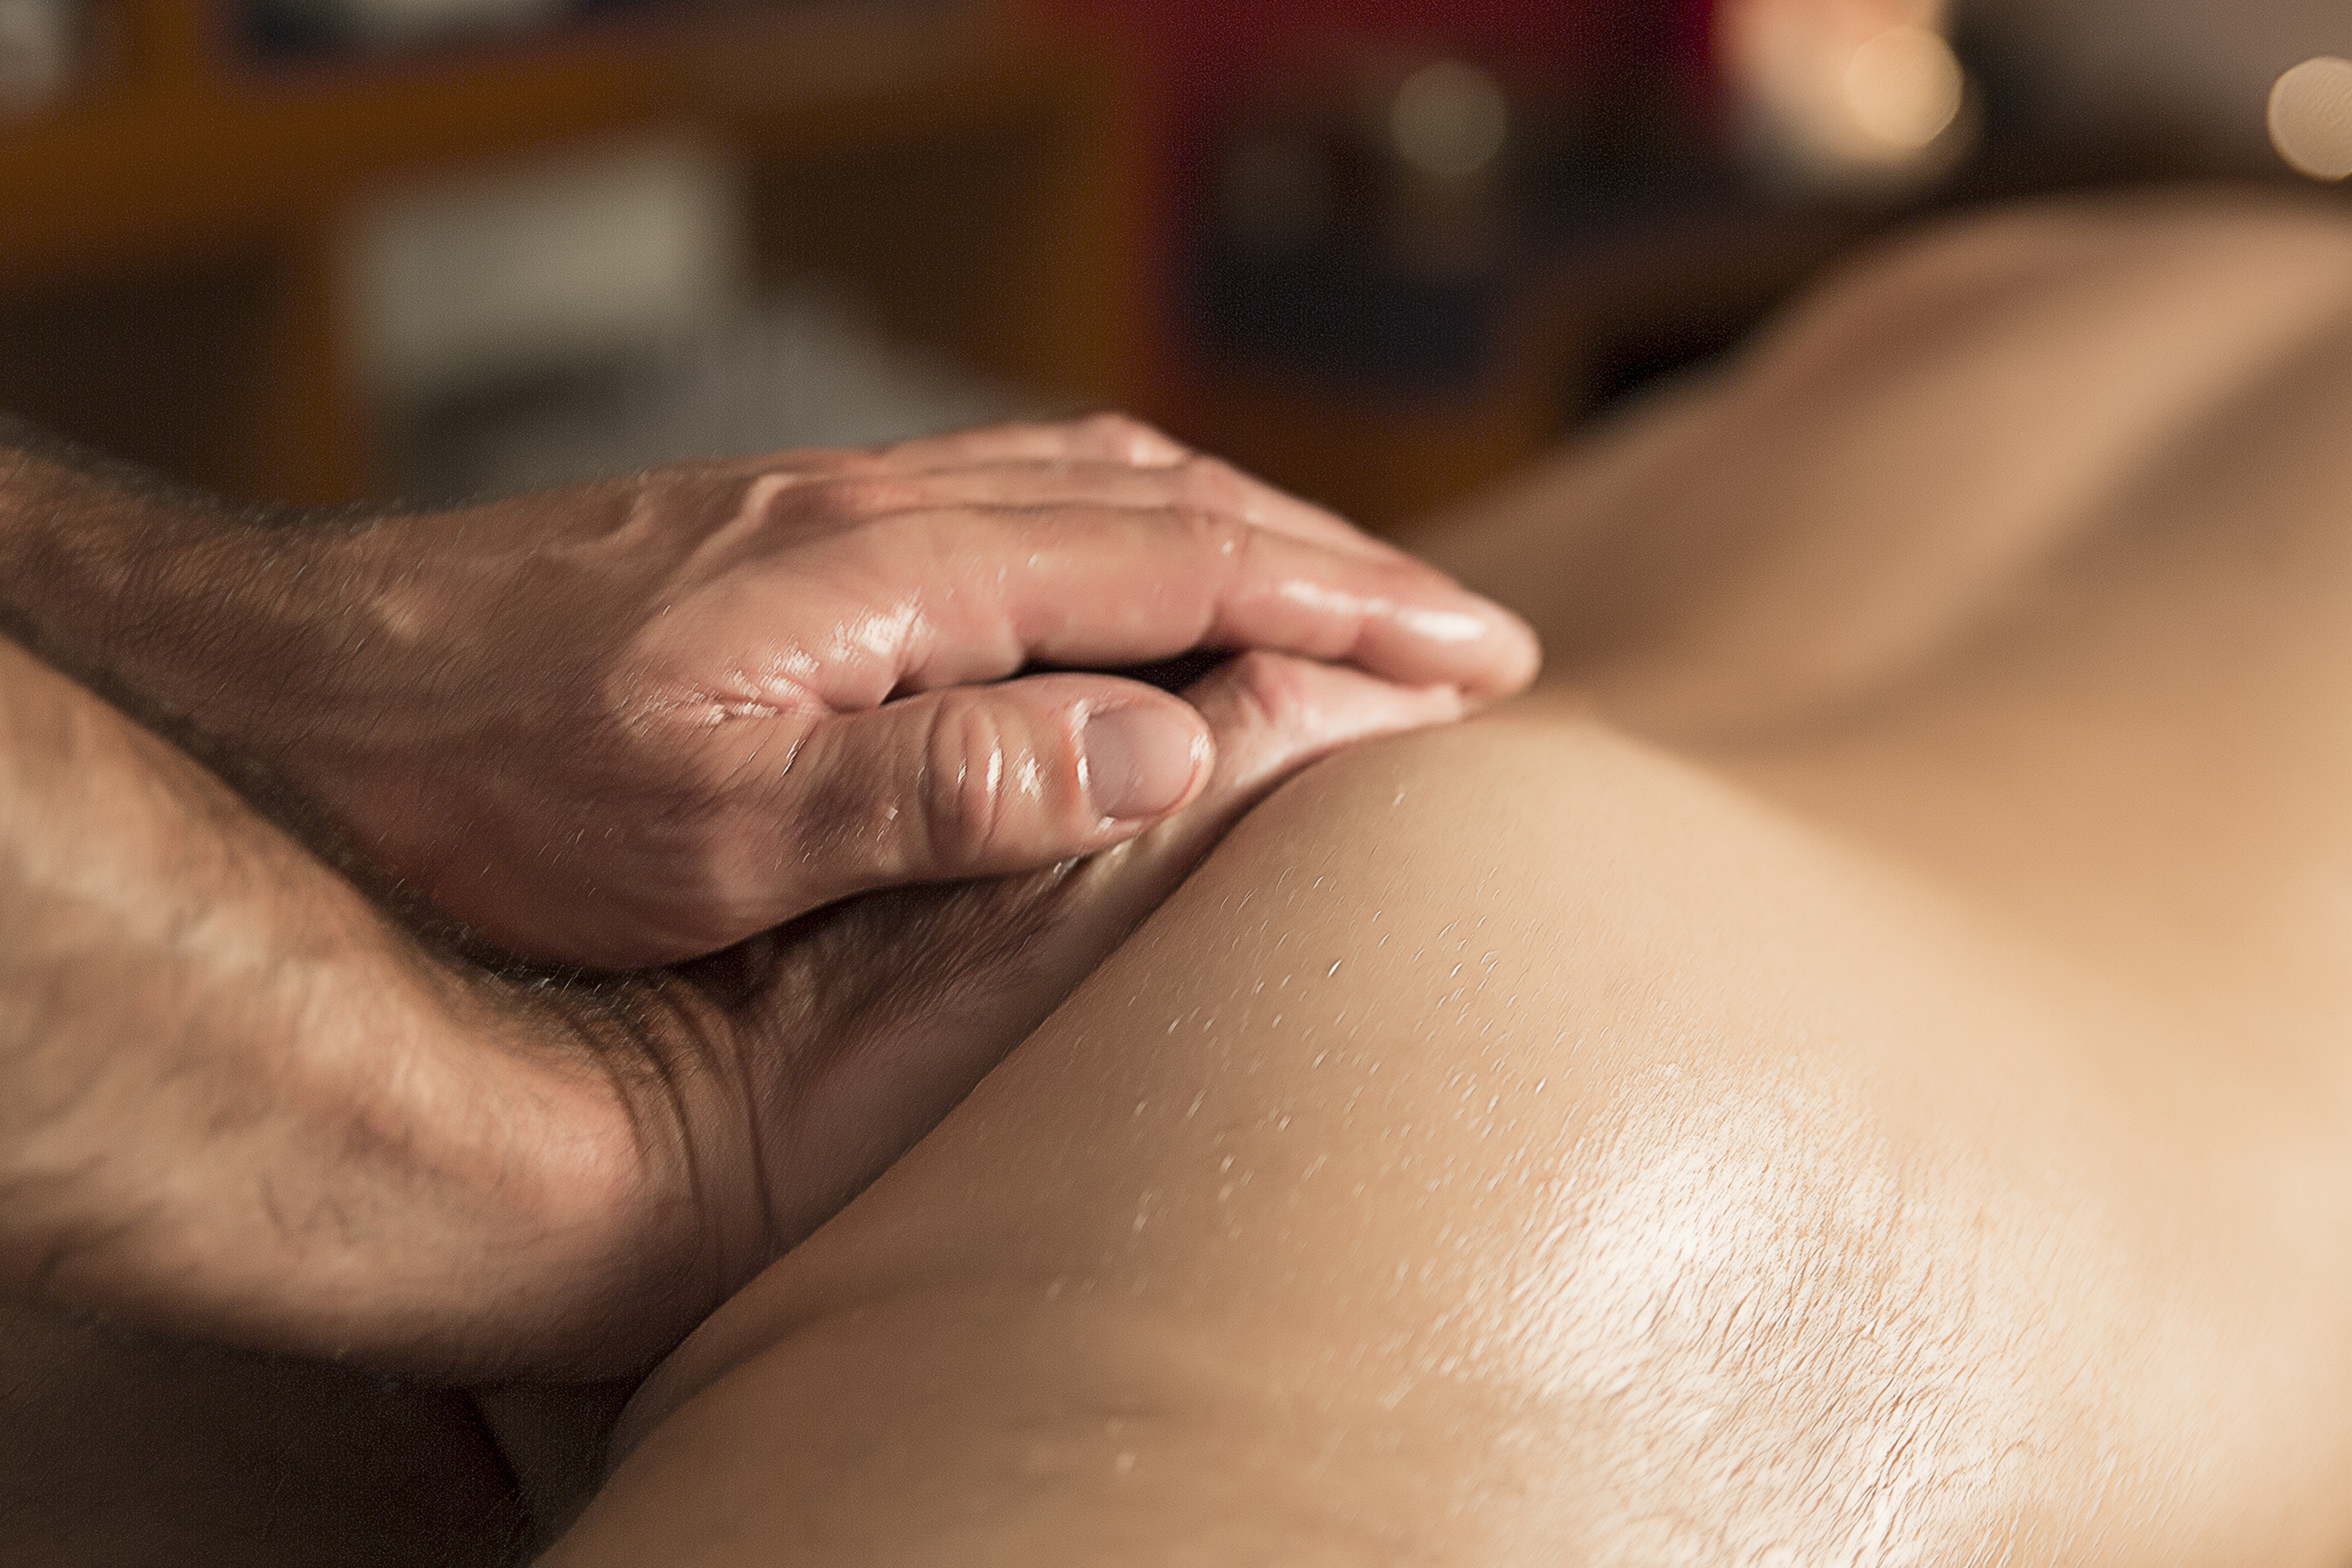 Massatge anal terapeutic